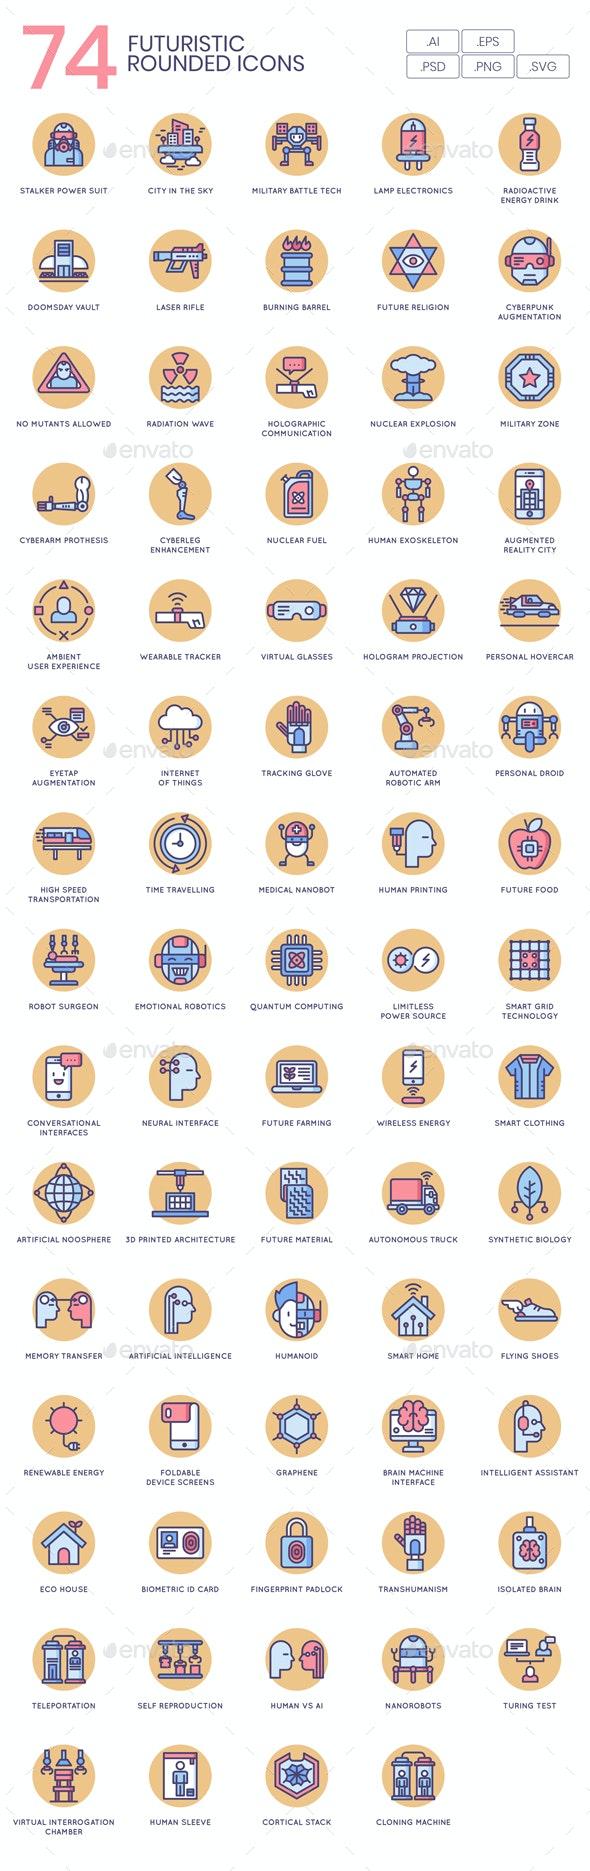 Future Technology Icons - Butterscotch - Technology Icons